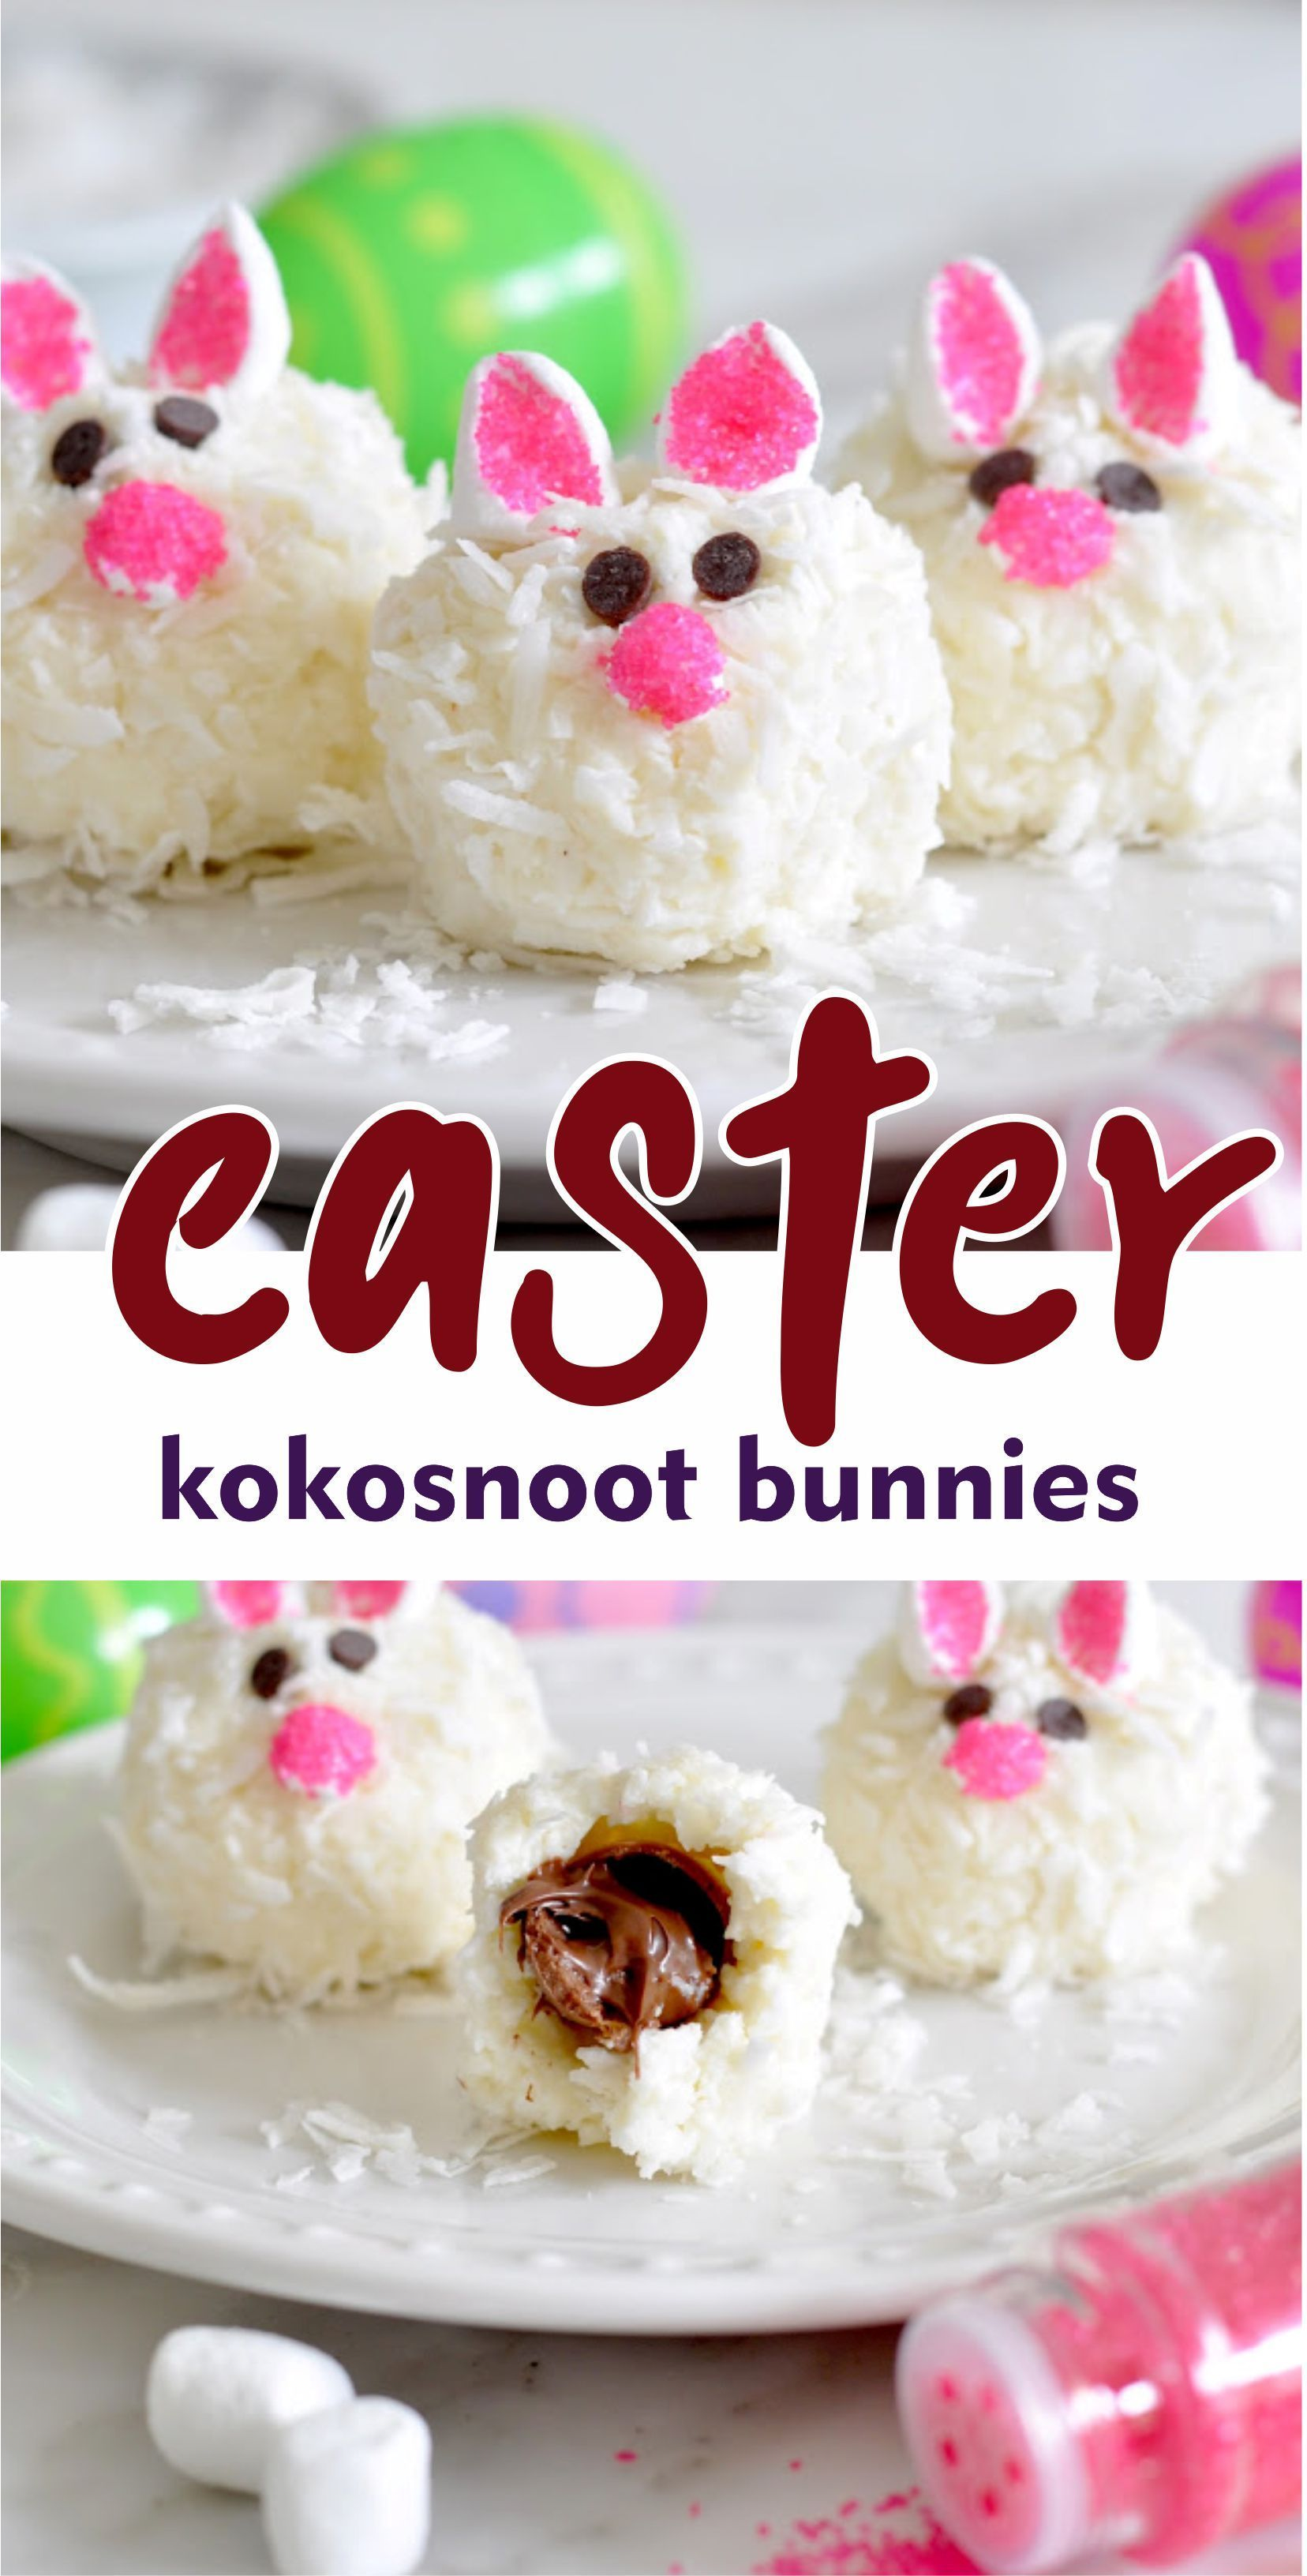 Easter Kokosnoot Bunnies  Unleash your inventiveness amongst these super cute, easy-to-make, no-bake kokosnoot snowball cookies perfectly decorated for jump in addition to Easter   #bunny #coconut #dessert #Easter #backen #backen kuchen #backen ostern #backen rezepte #backen torten #baking #baking cakes #baking desserts #baking recipes #cute baking #easy baking #healthy baking